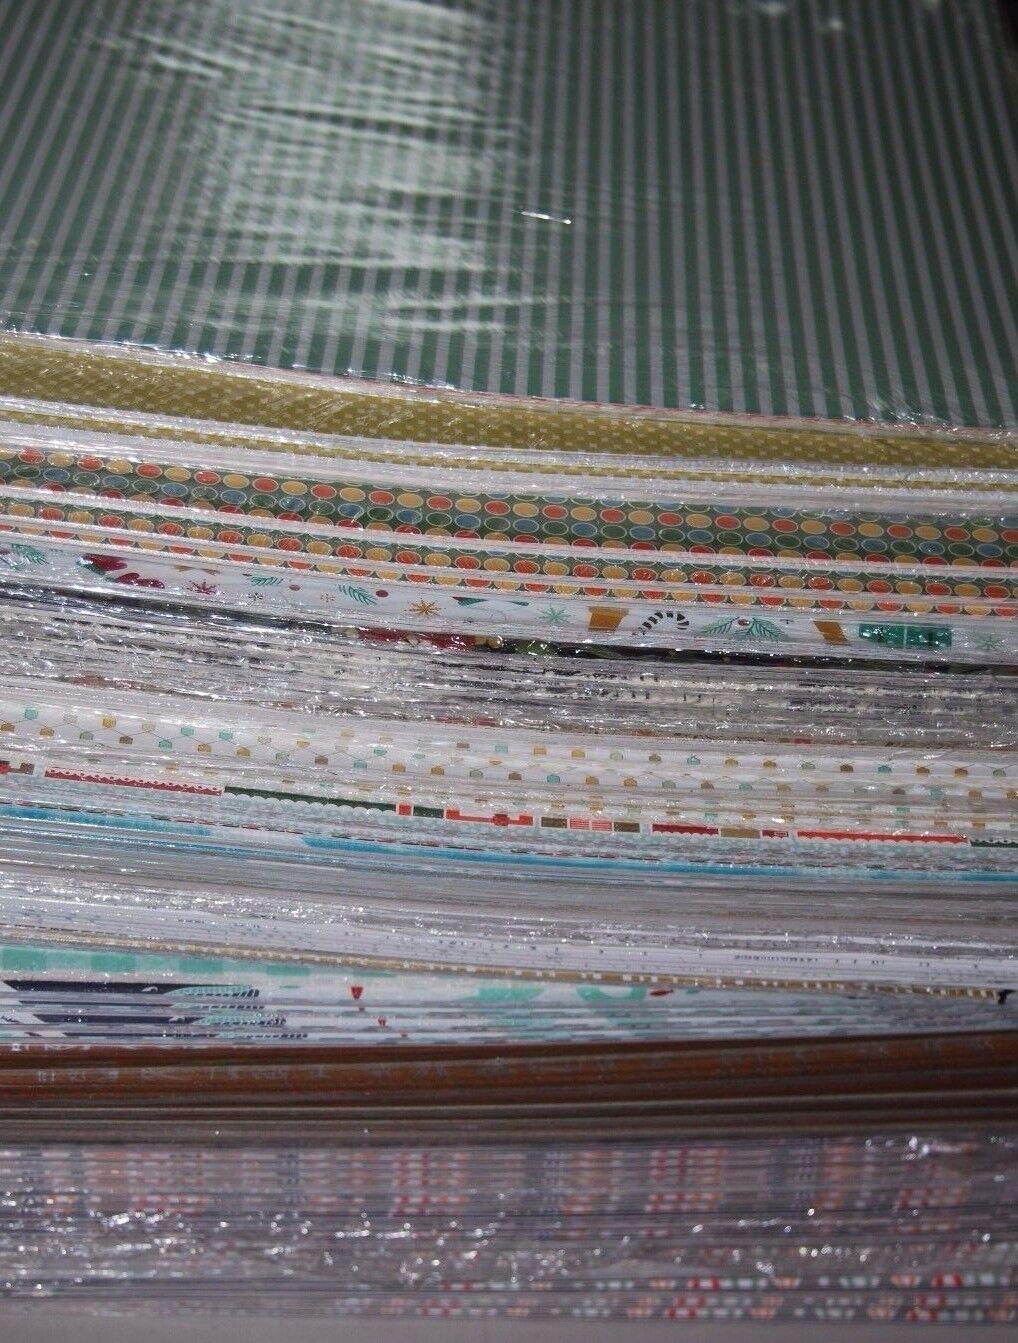 как выглядит Stampin Up 12 X 12 DSP - Paper - All NIP - You Choose фото